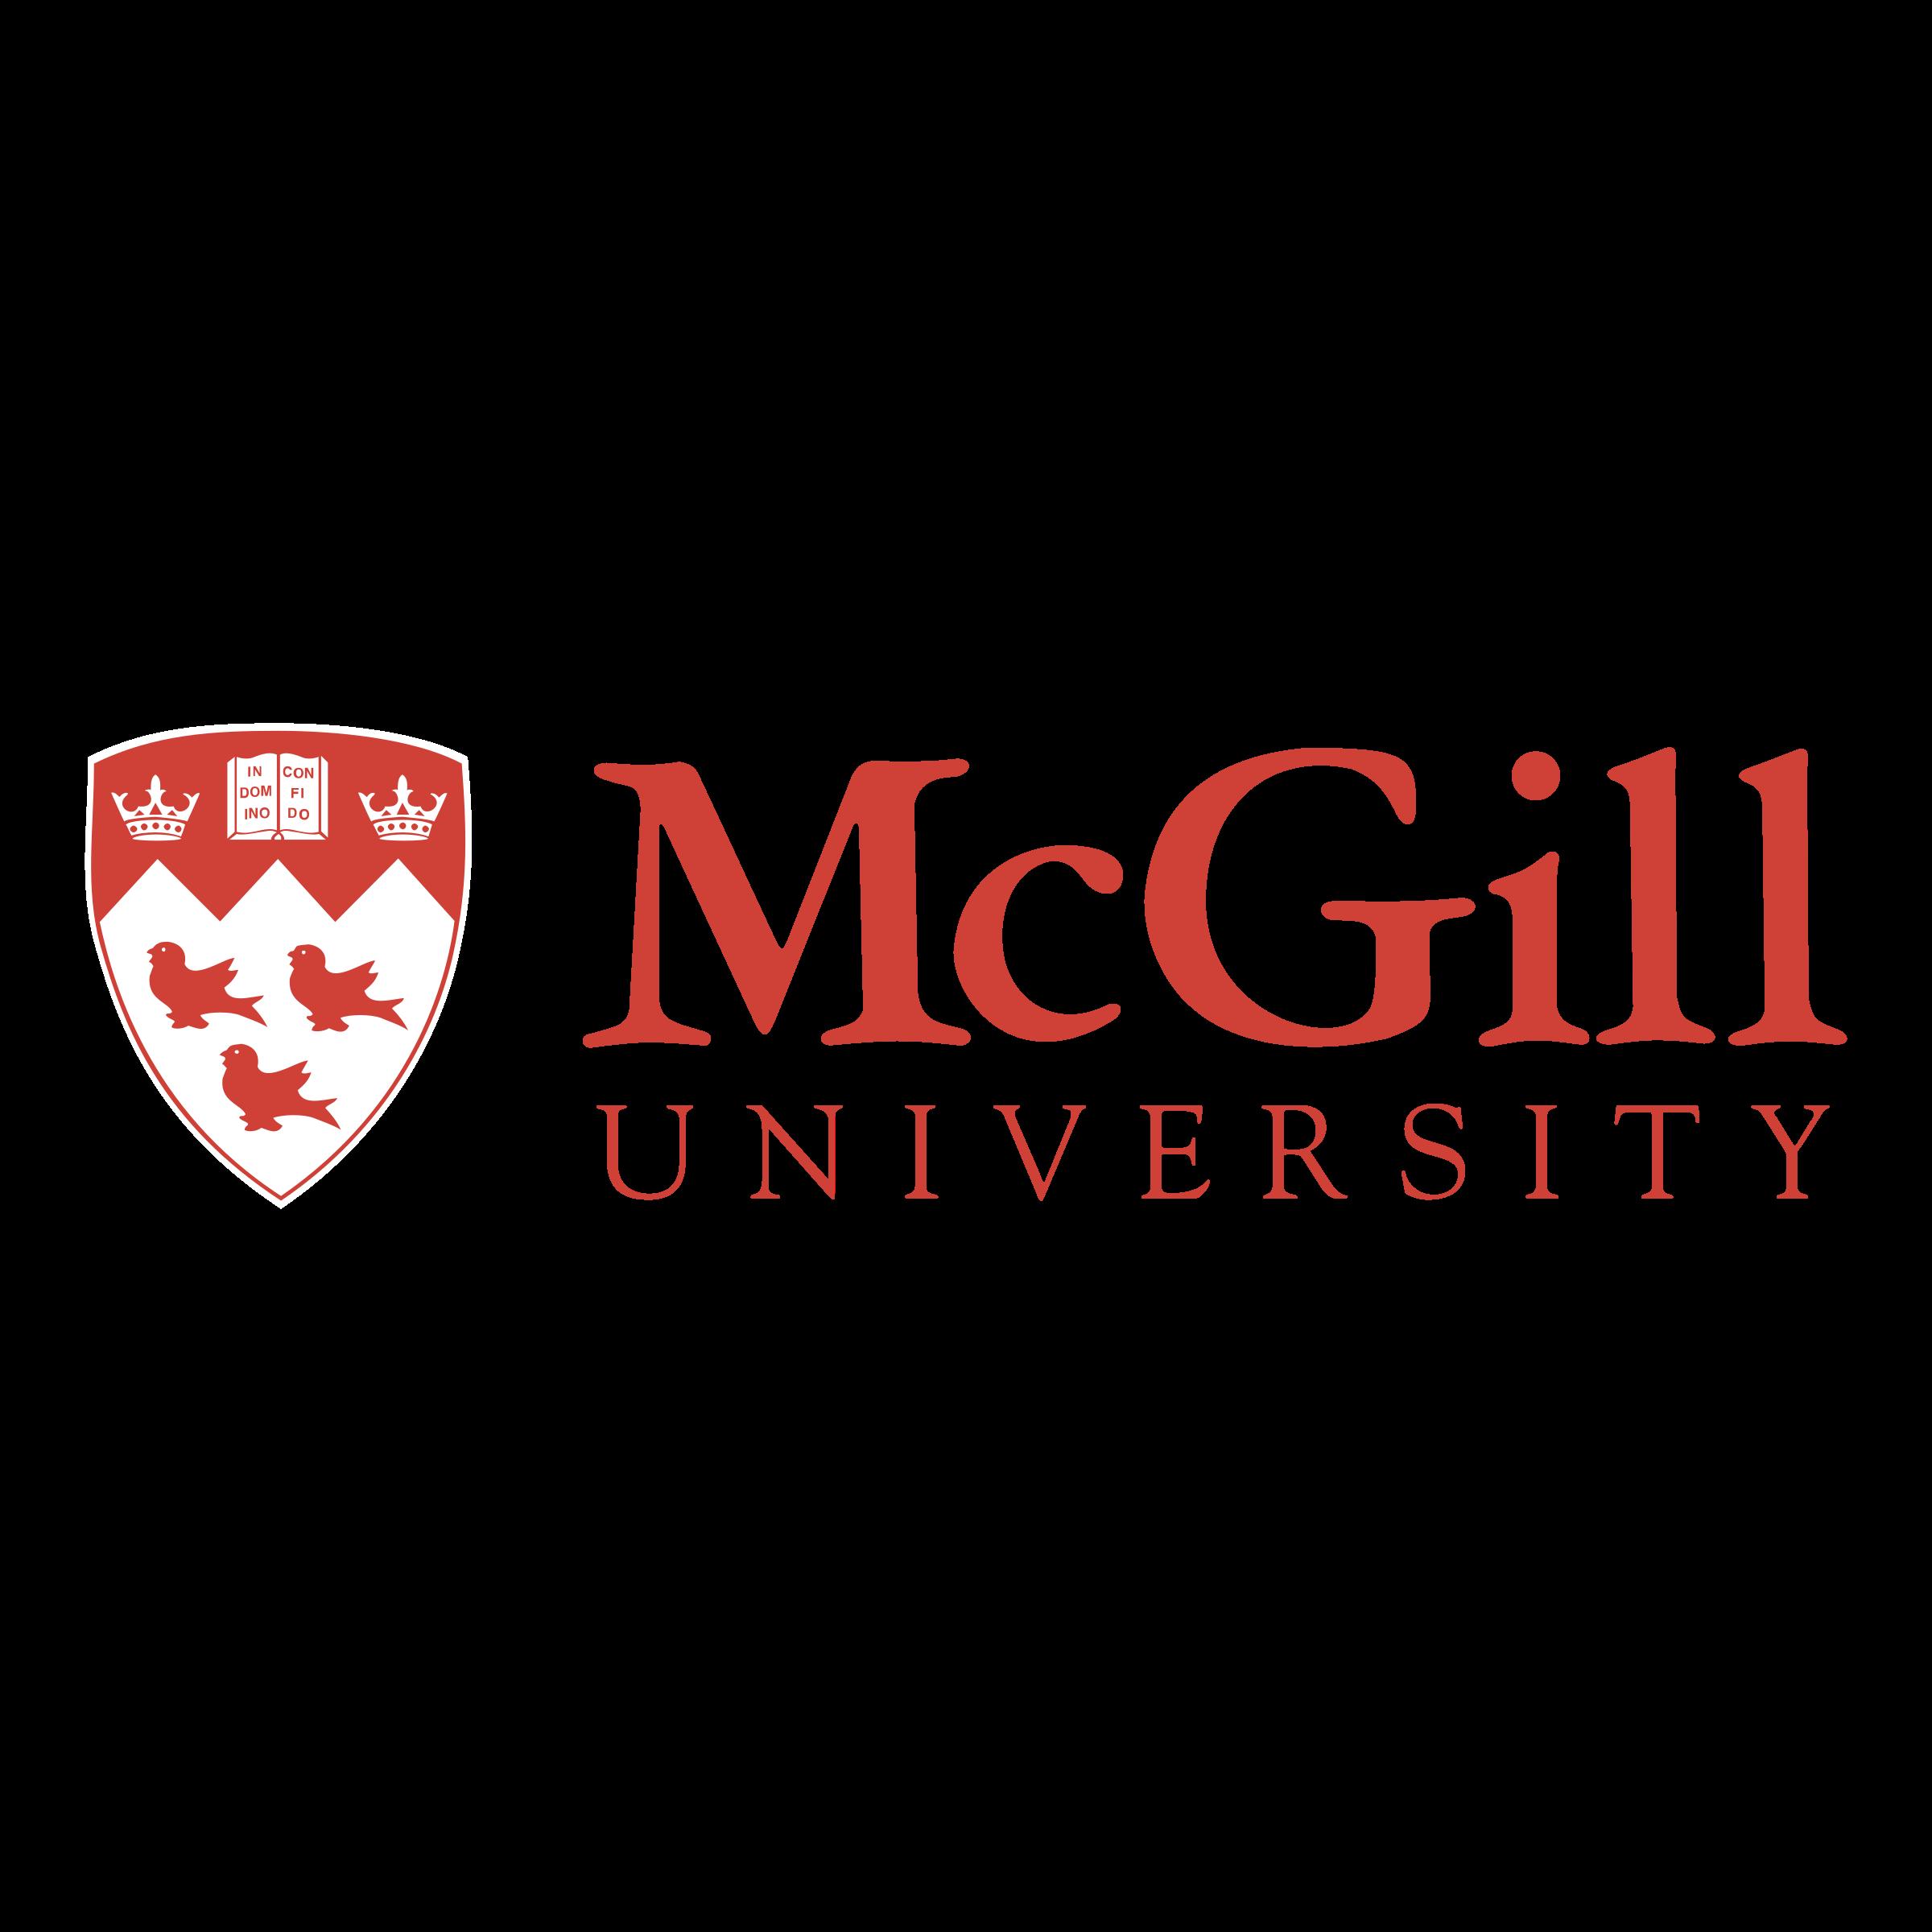 mcgill-university-logo-png-transparent